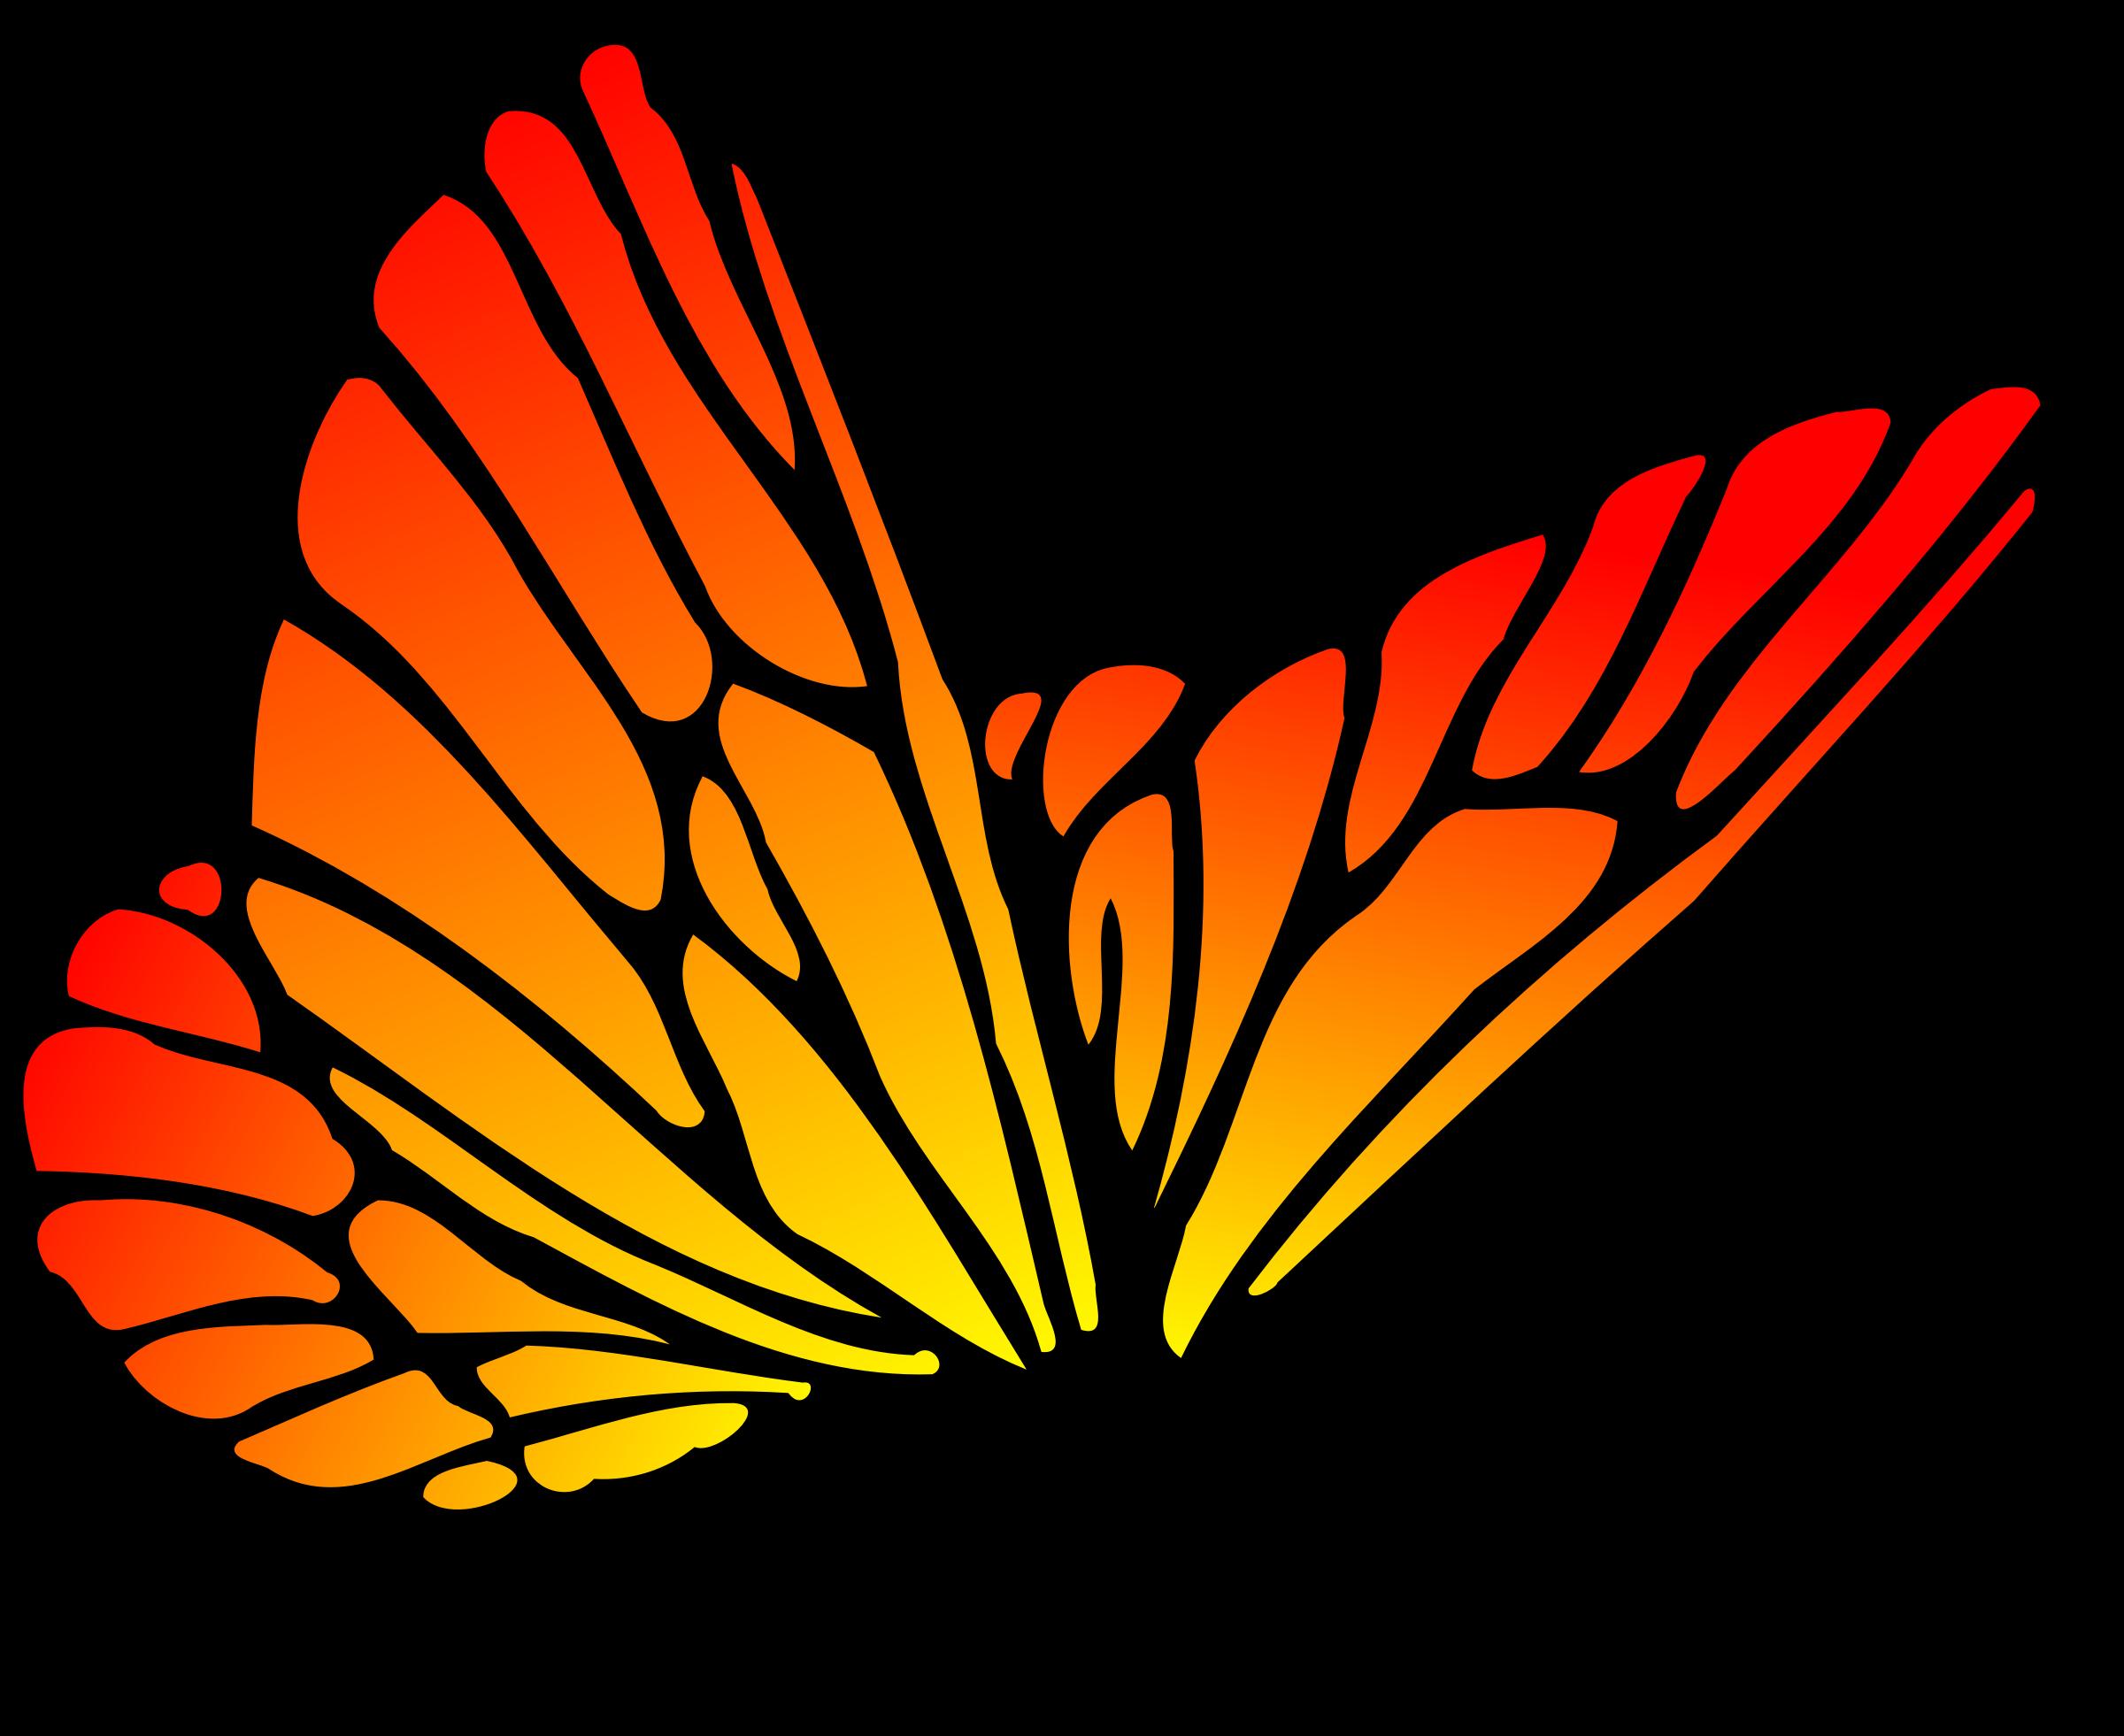 Red orange butterfly.